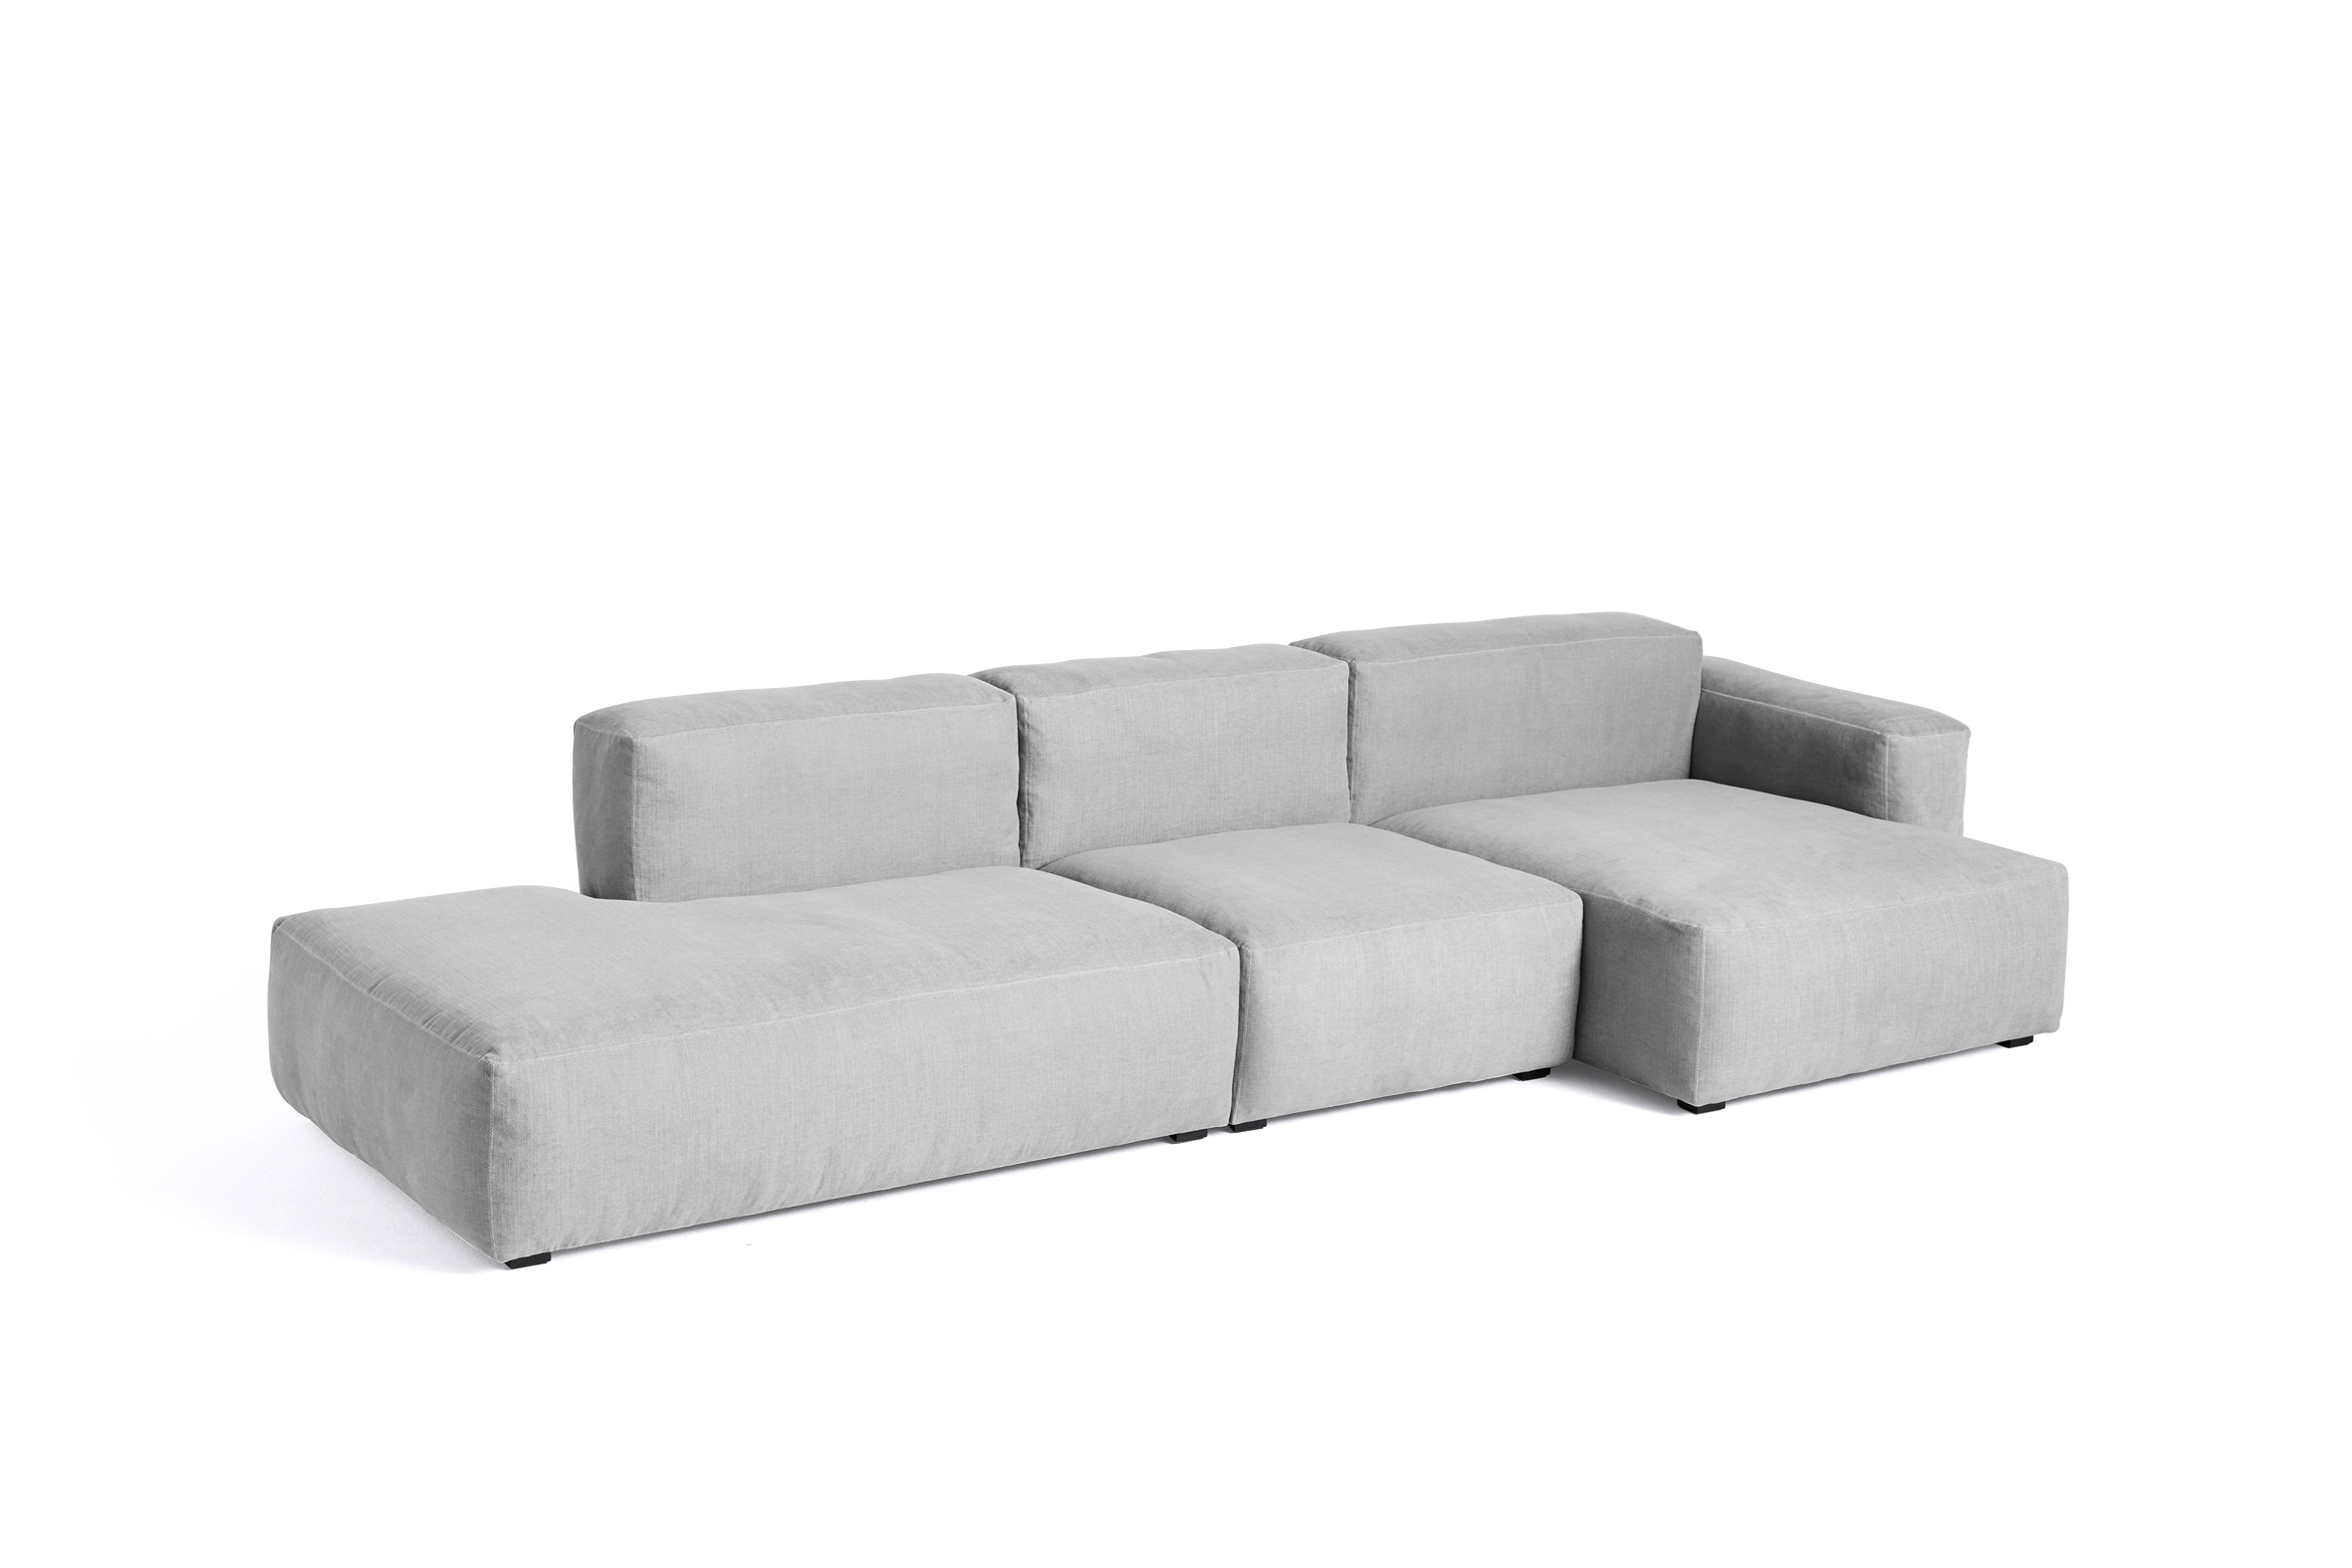 HAY Mags Soft Sofa 3 Sitzer Kombination 4 right low